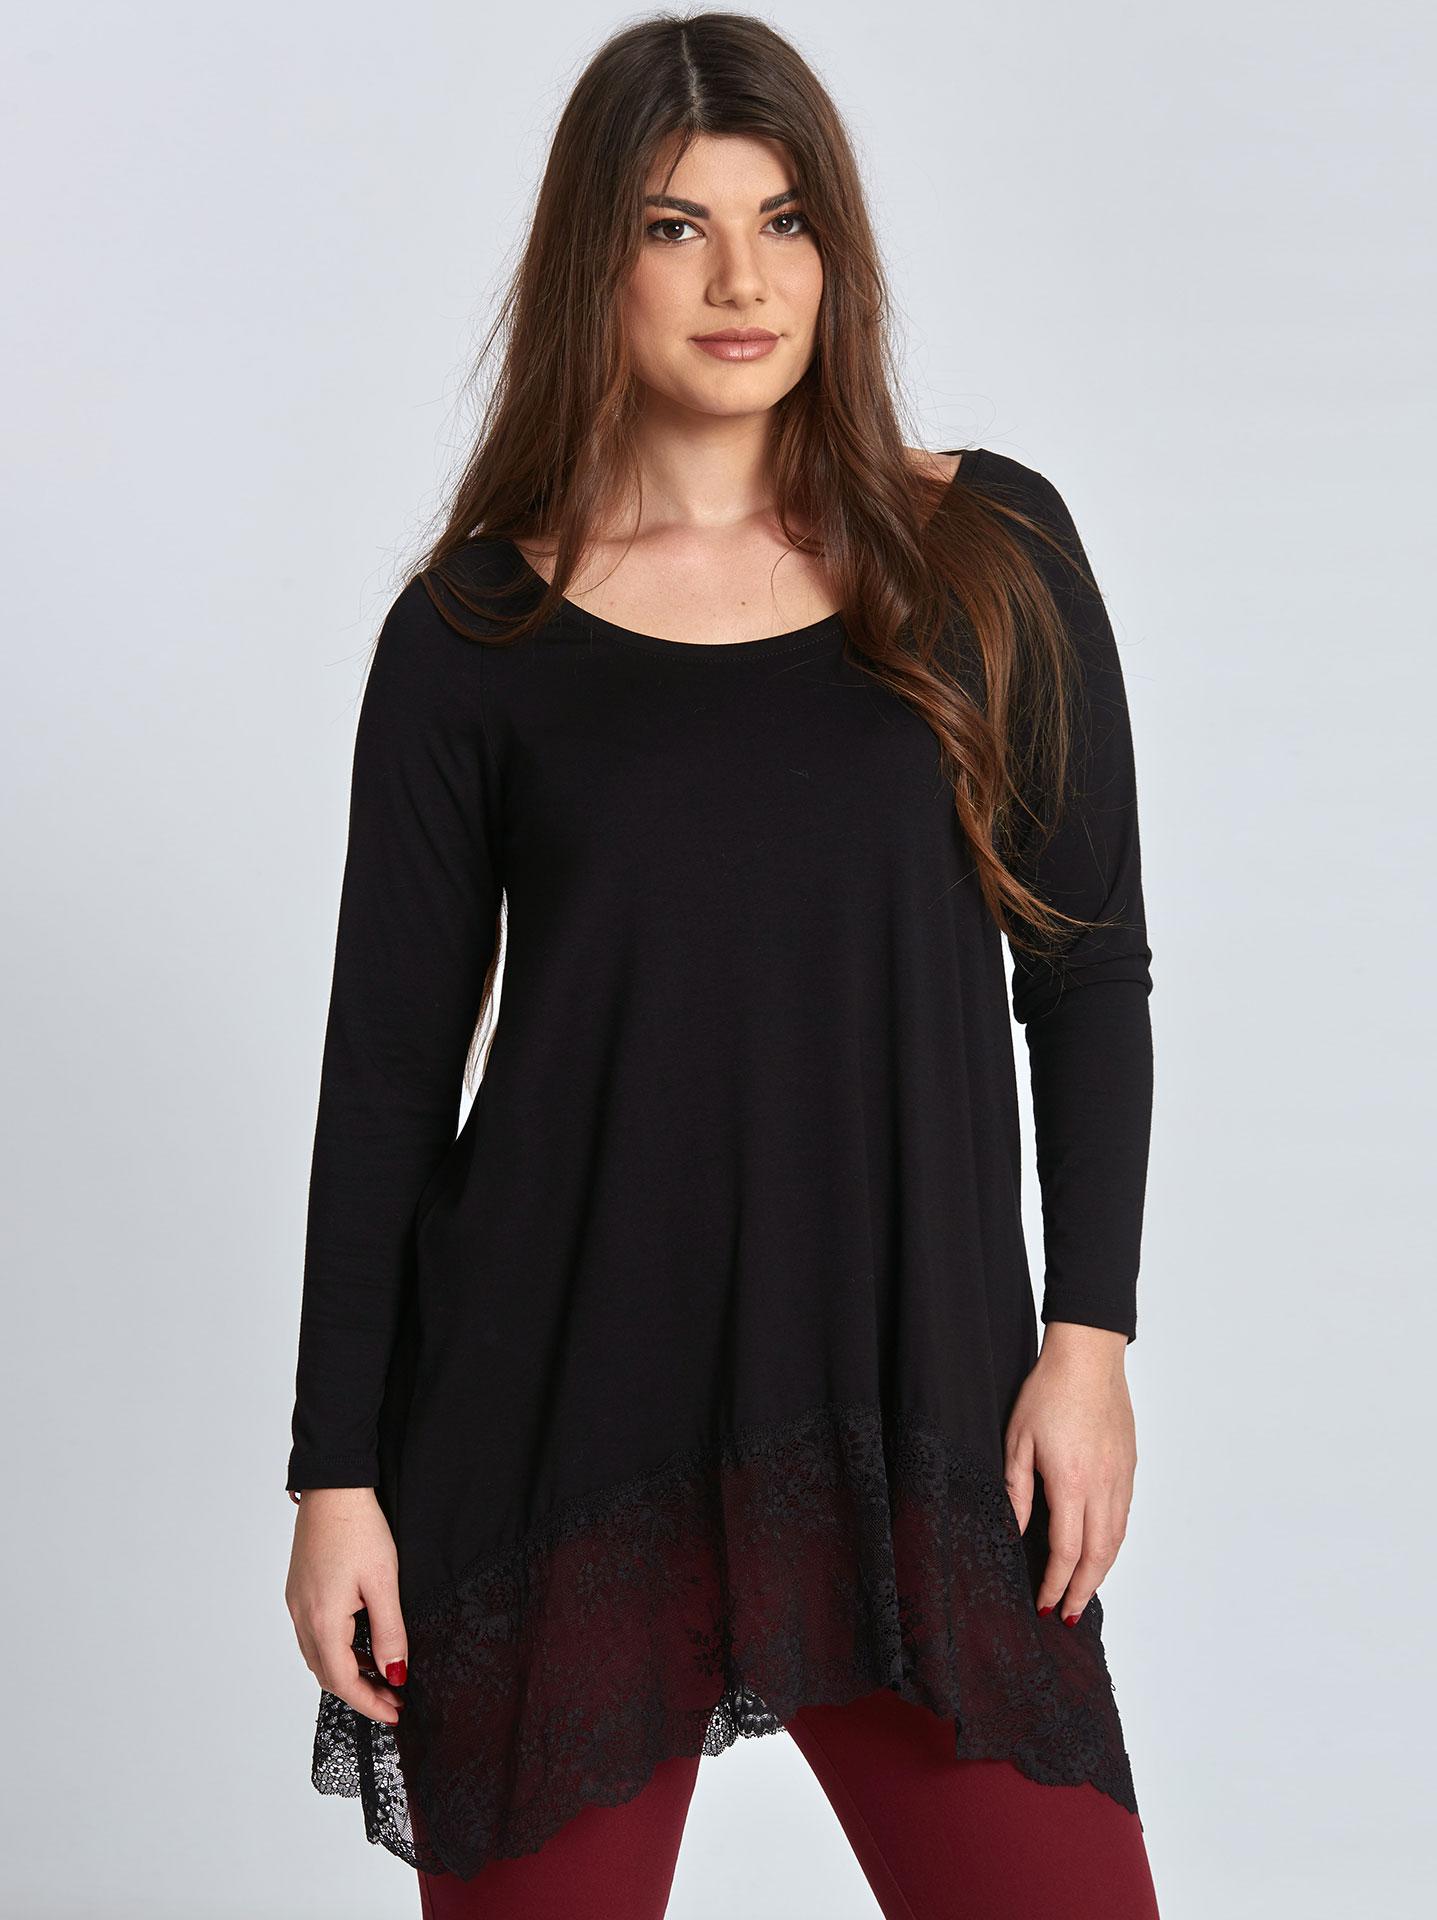 Plus size μπλούζα με δαντέλα σε μαυρο 2bb34504d41